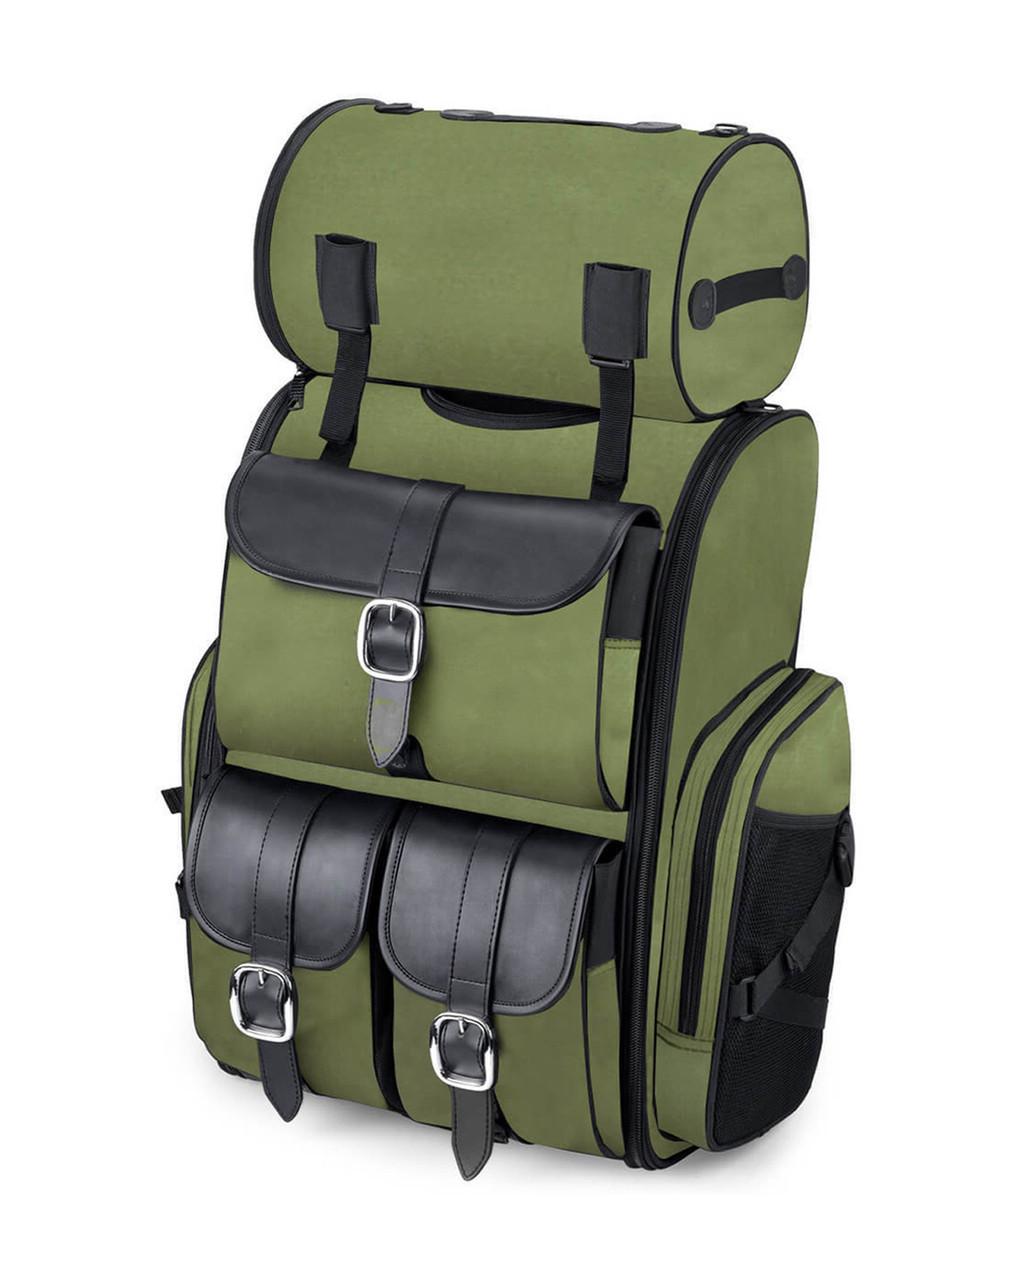 Viking Extra Large Plain Green Motorcycle Sissy Bar Bag For Harley Davidson Main view